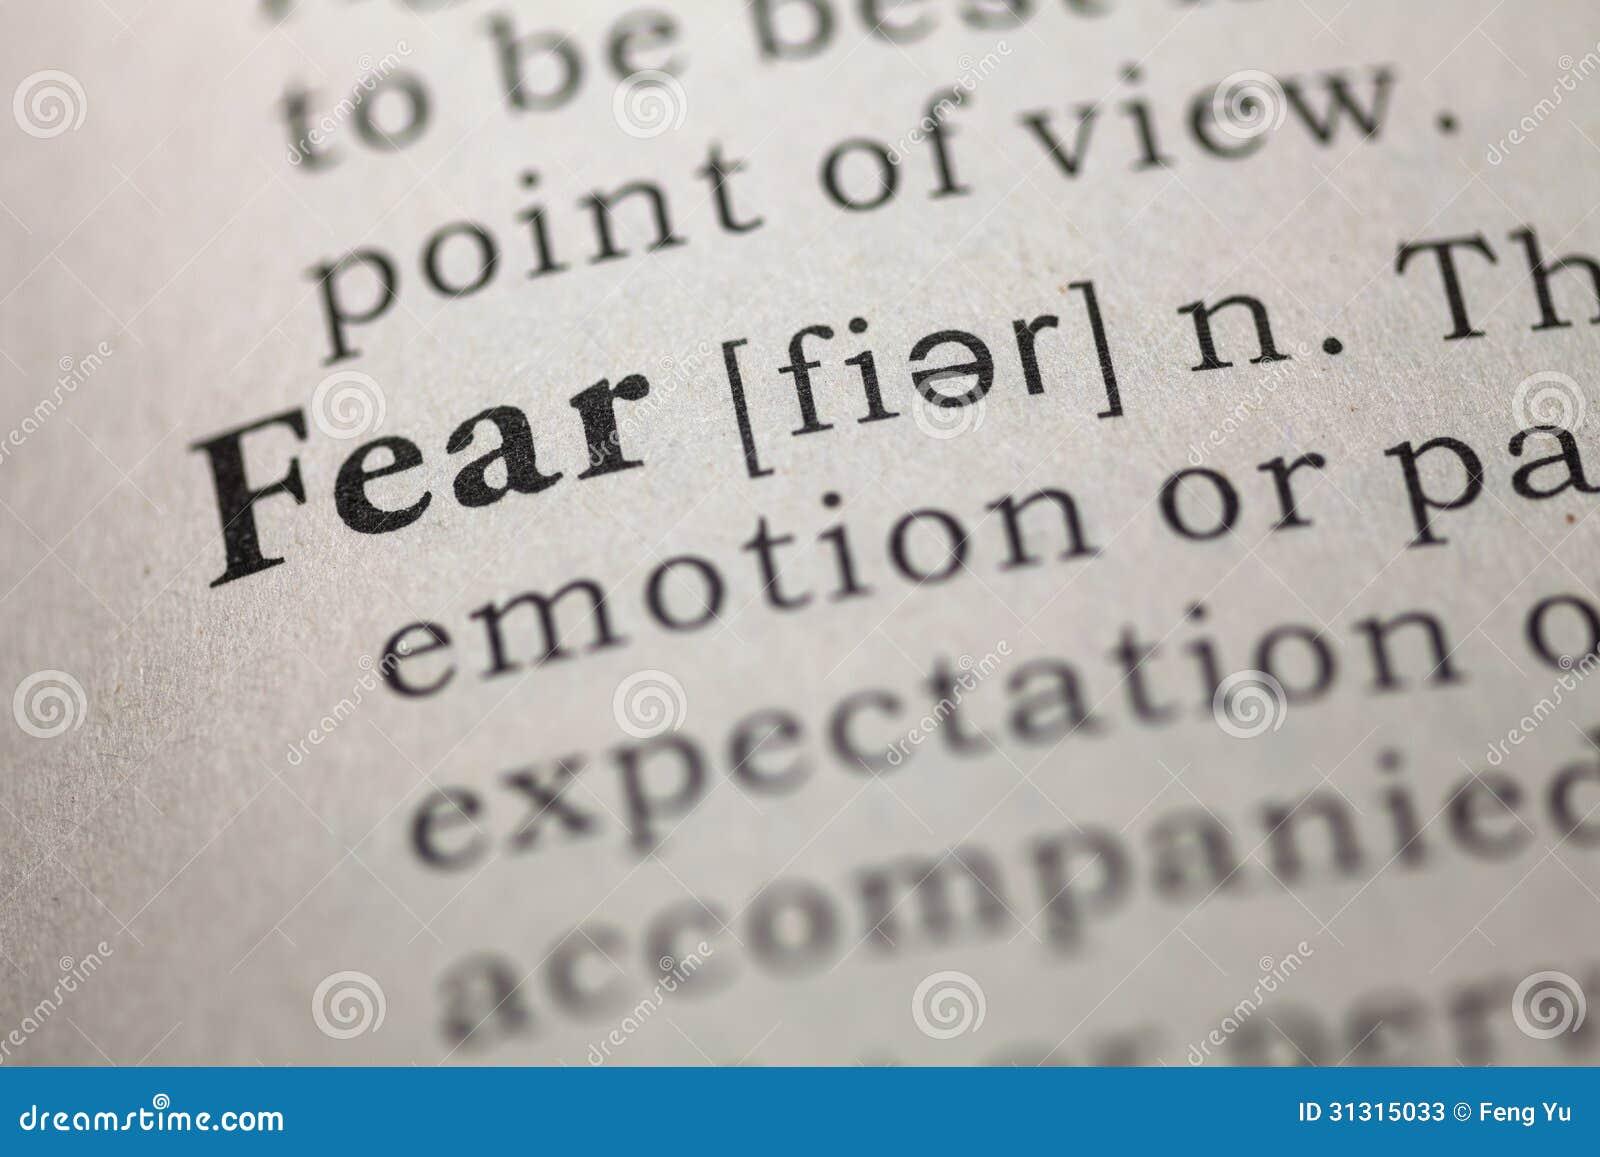 Define the term phobia